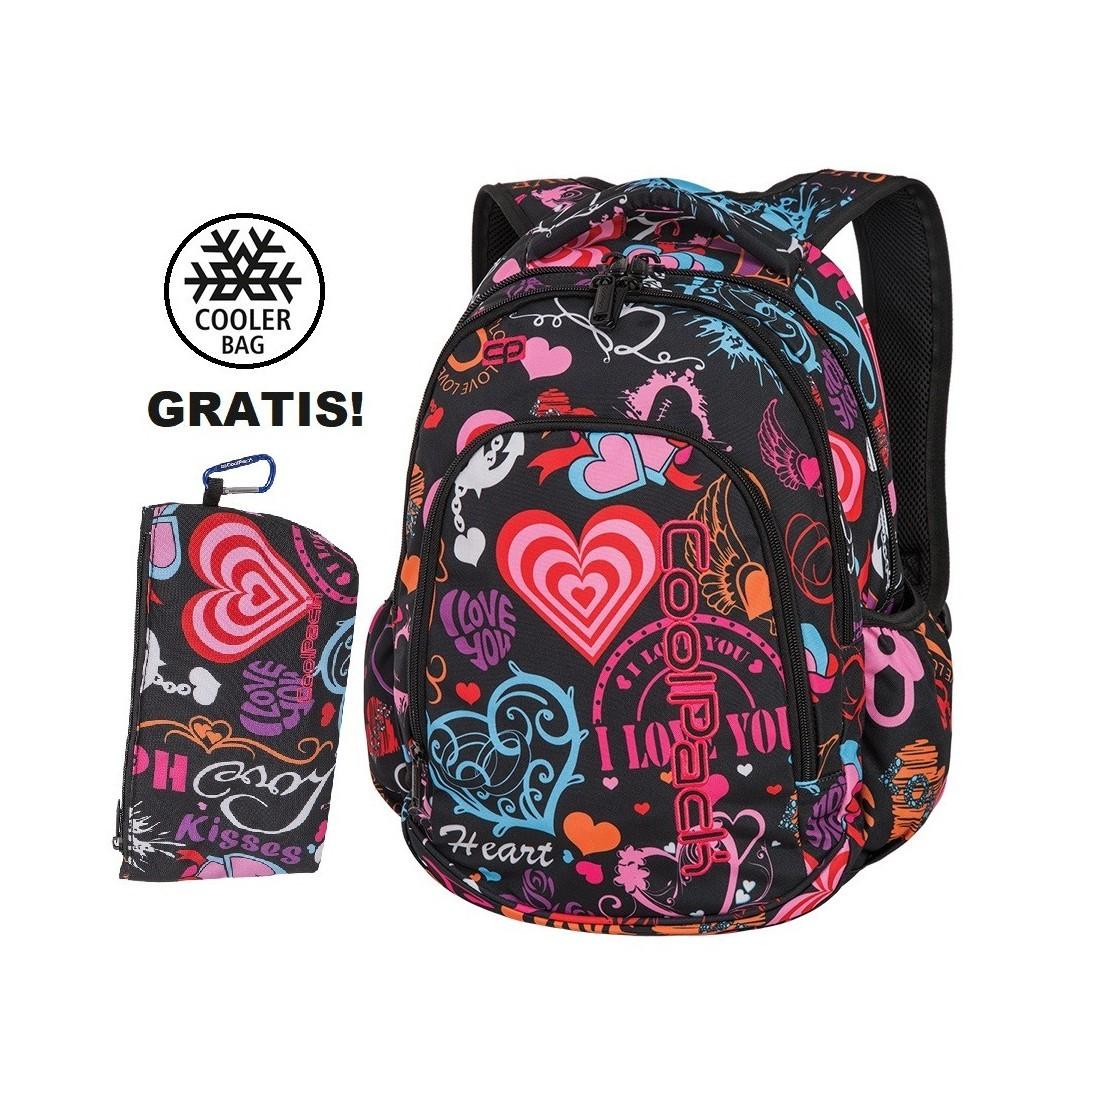 059268f276465 Plecak szkolny (do klas 1-3) CoolPack CP PRIME EMOTIONS w kolorowe serca